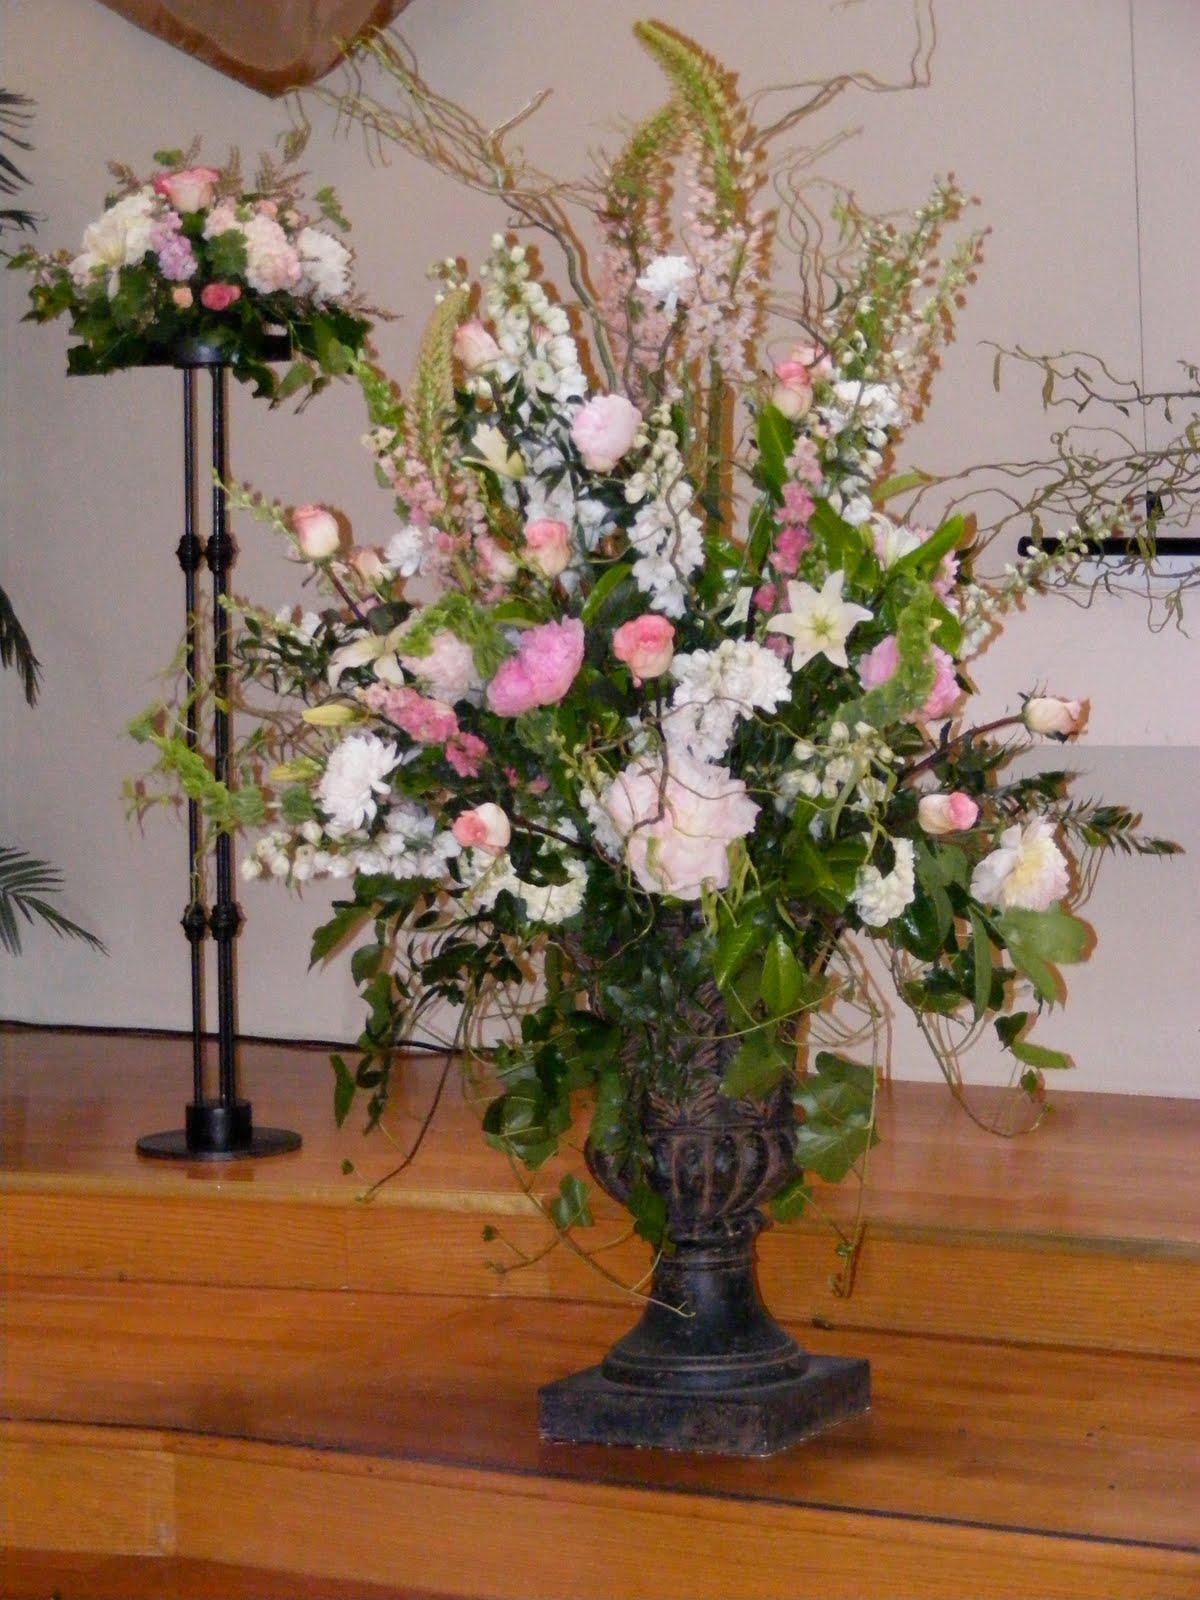 Floral Silk Arrangements For Home